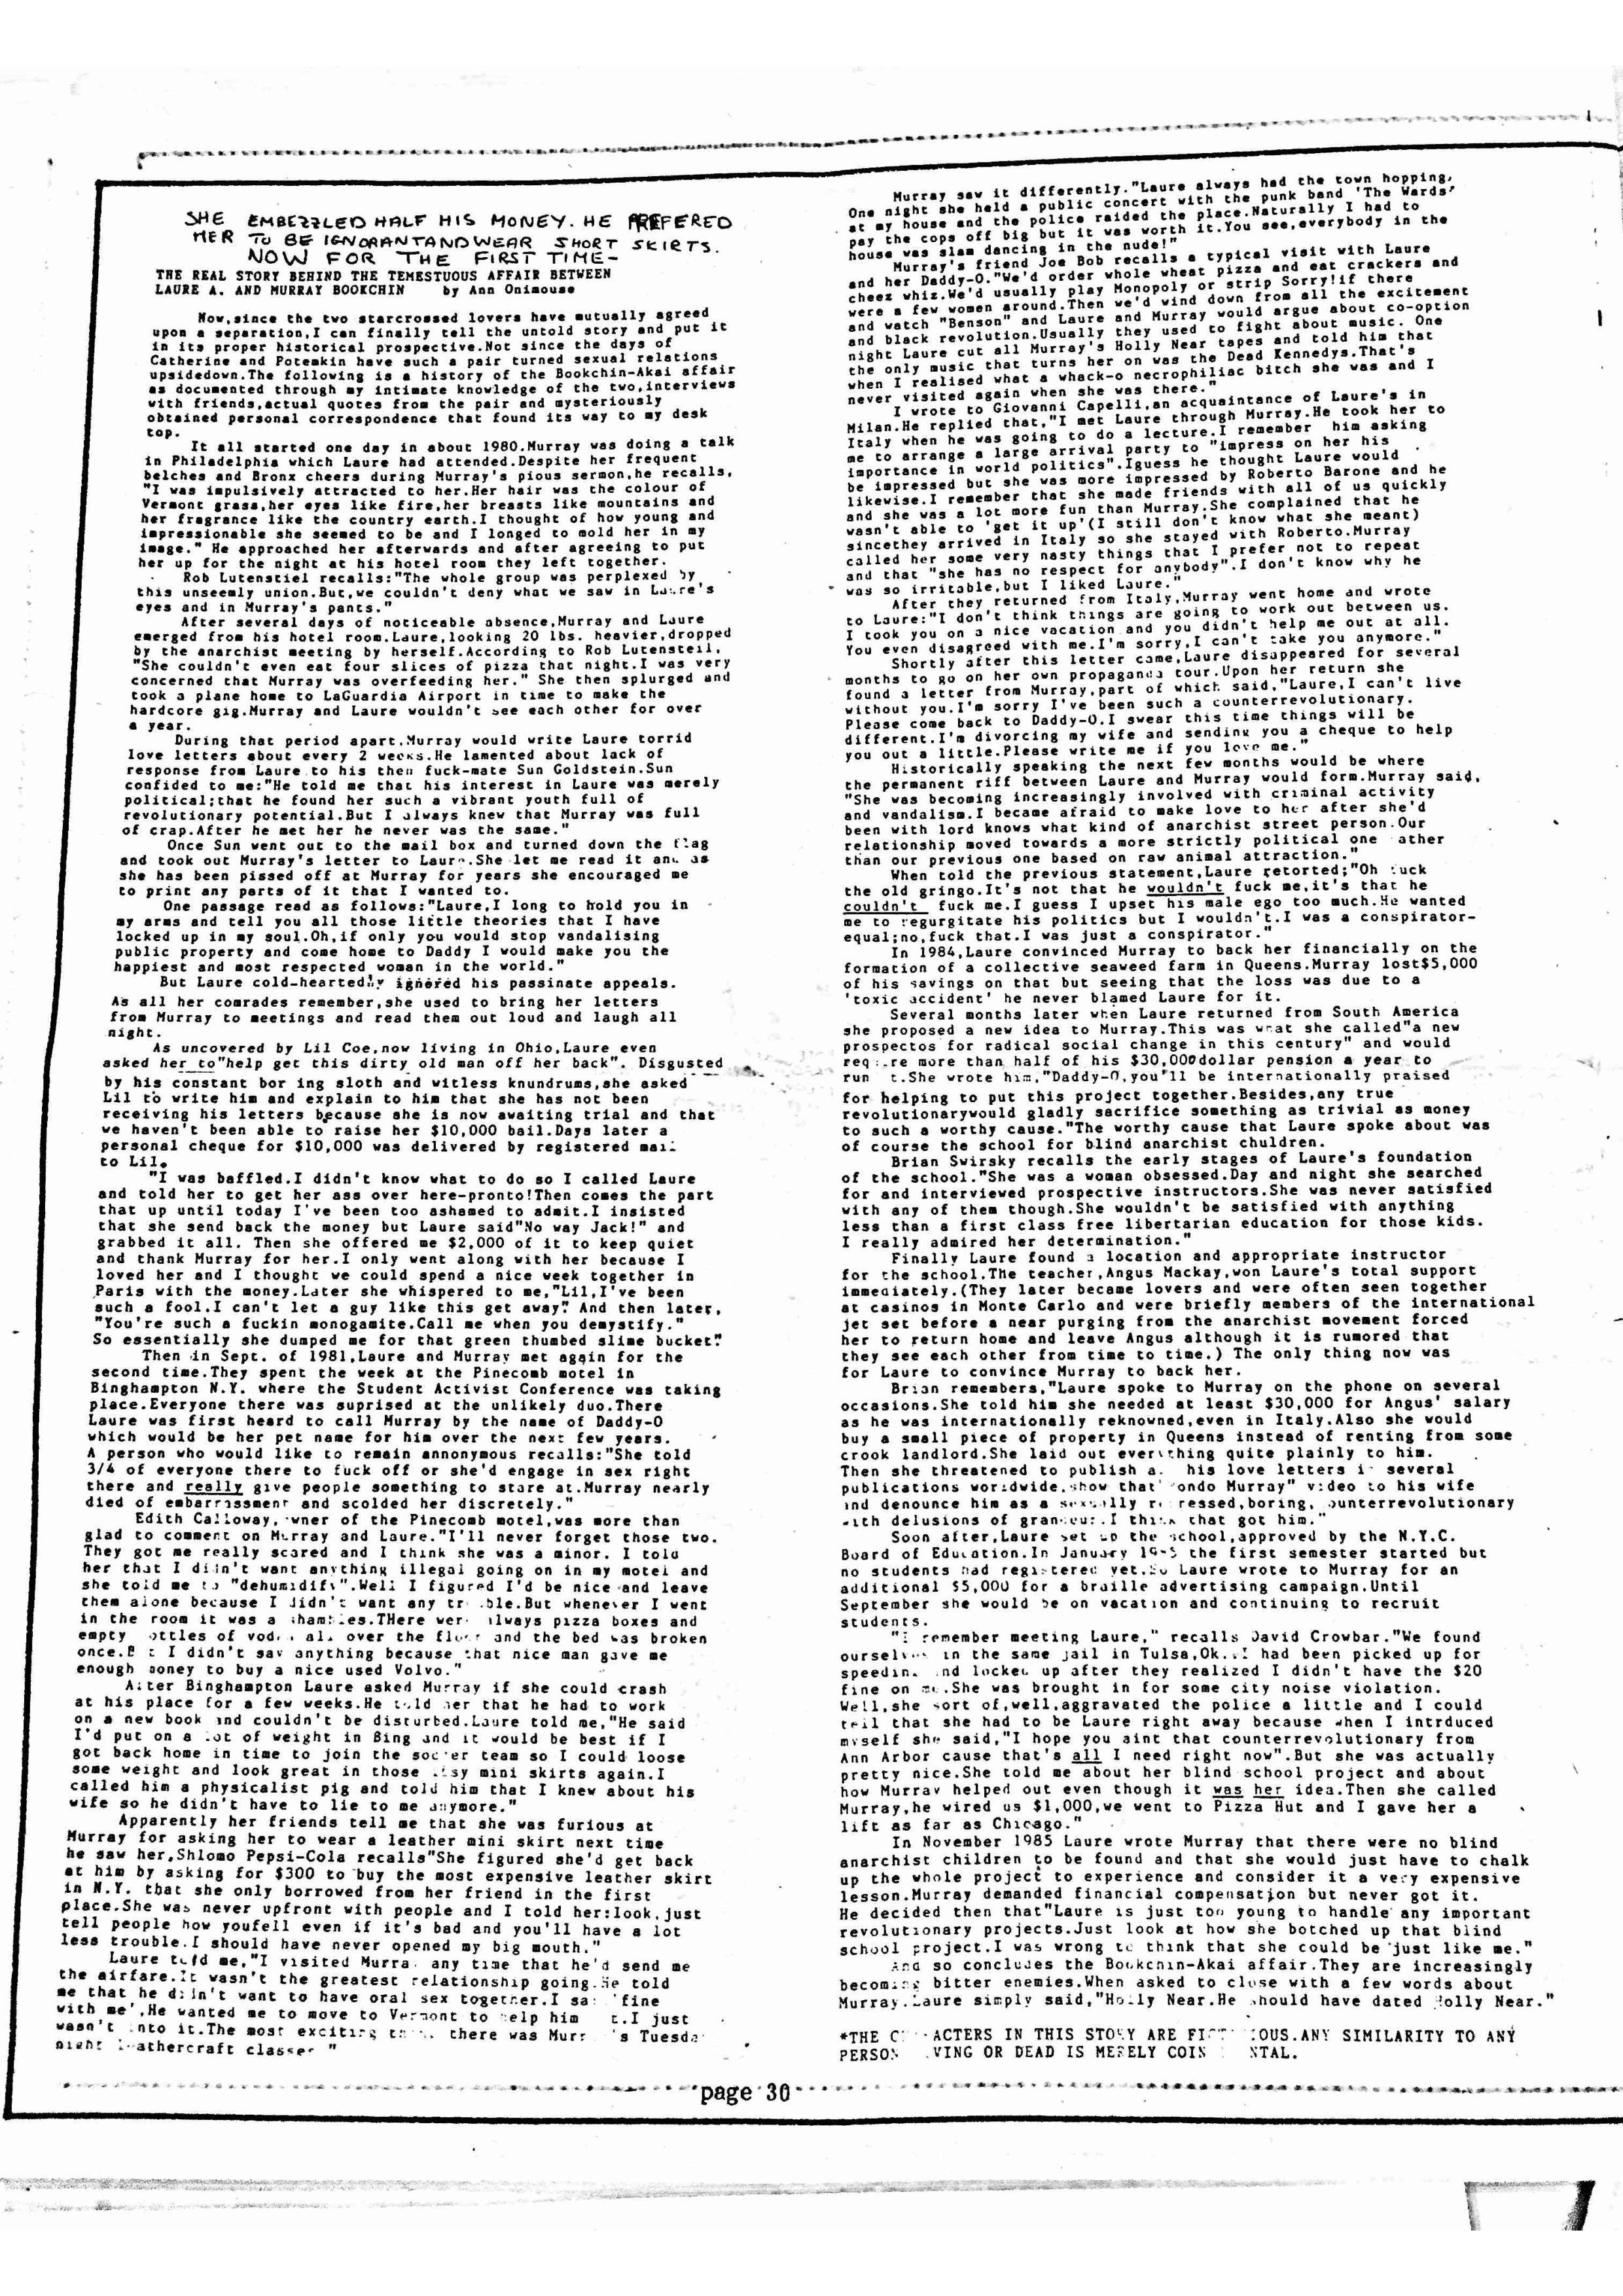 PopRealLast3-page-010.jpg